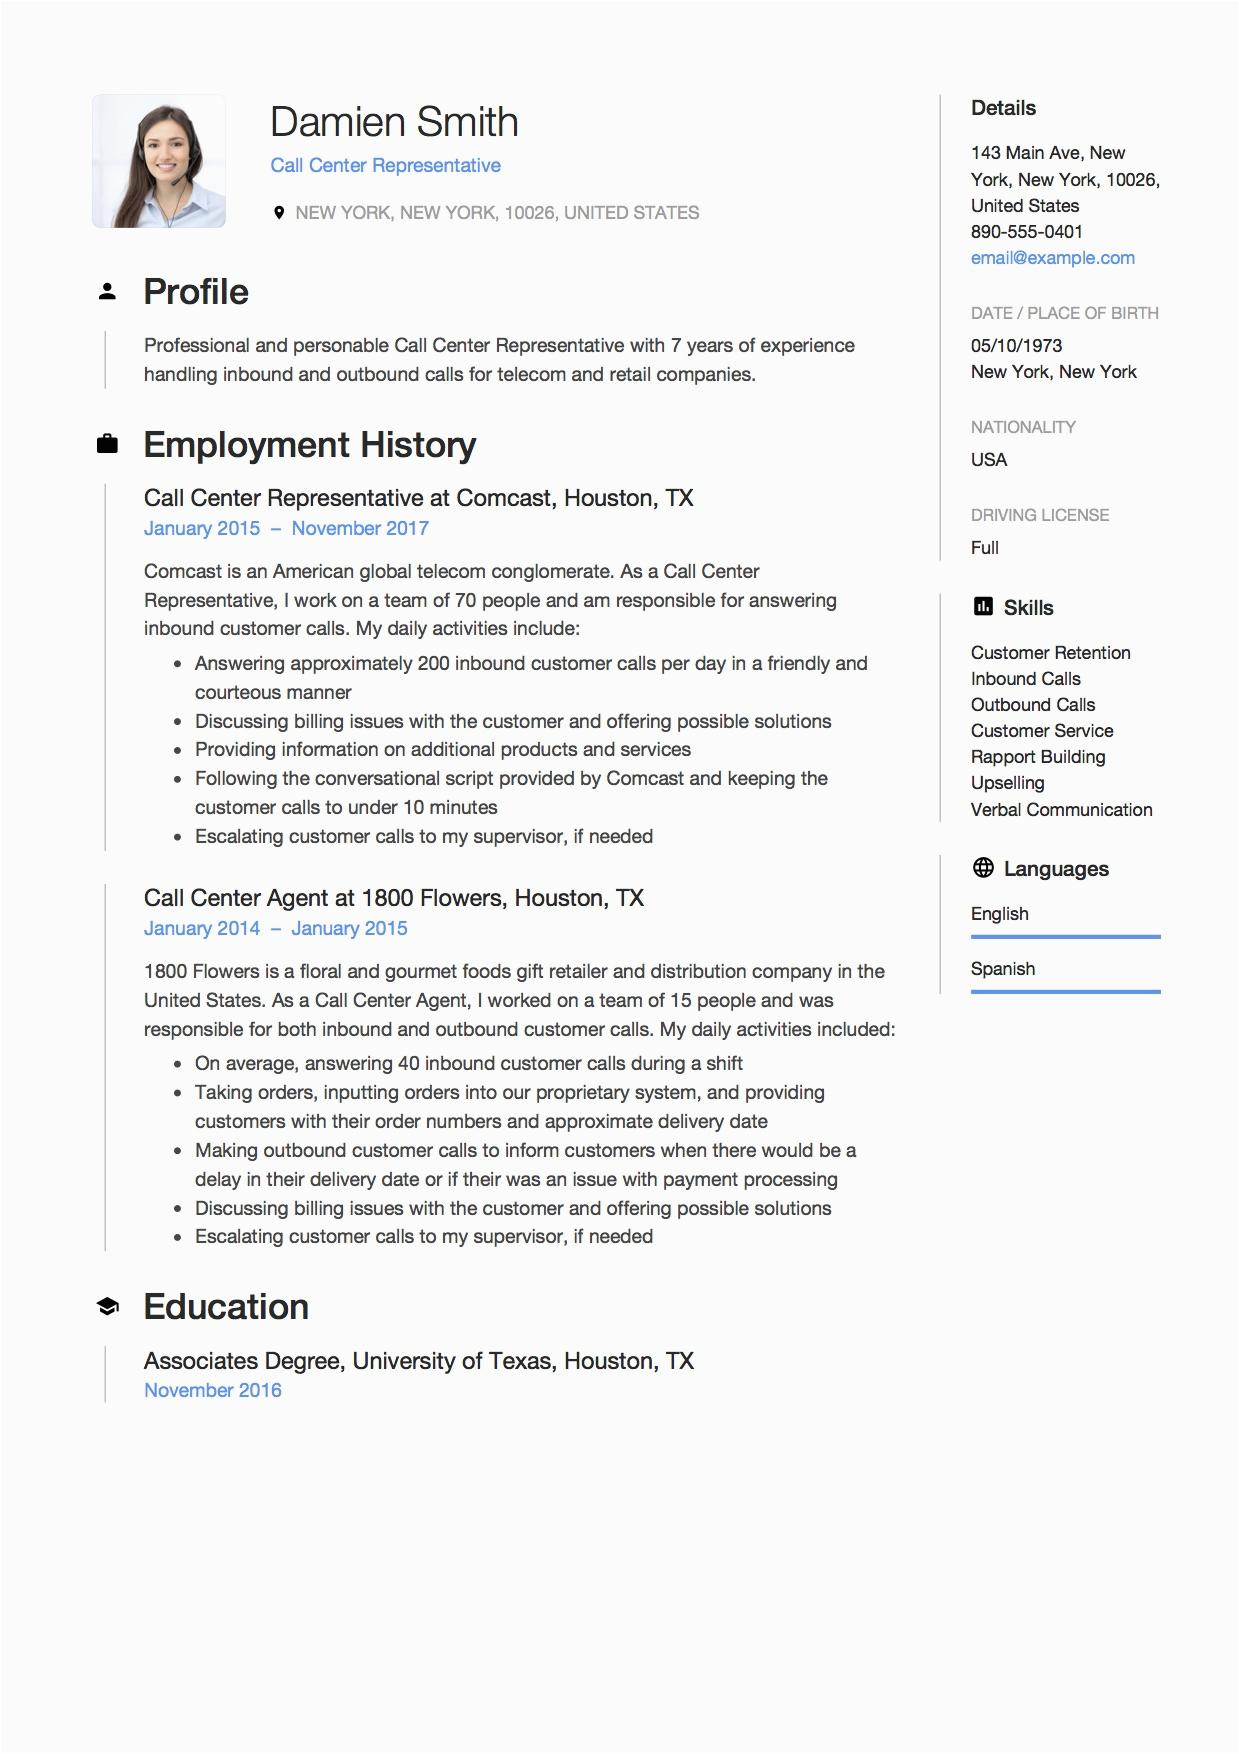 Resume Samples for Call Center Job 12 Call Center Representative Resume Sample S 2018 Free